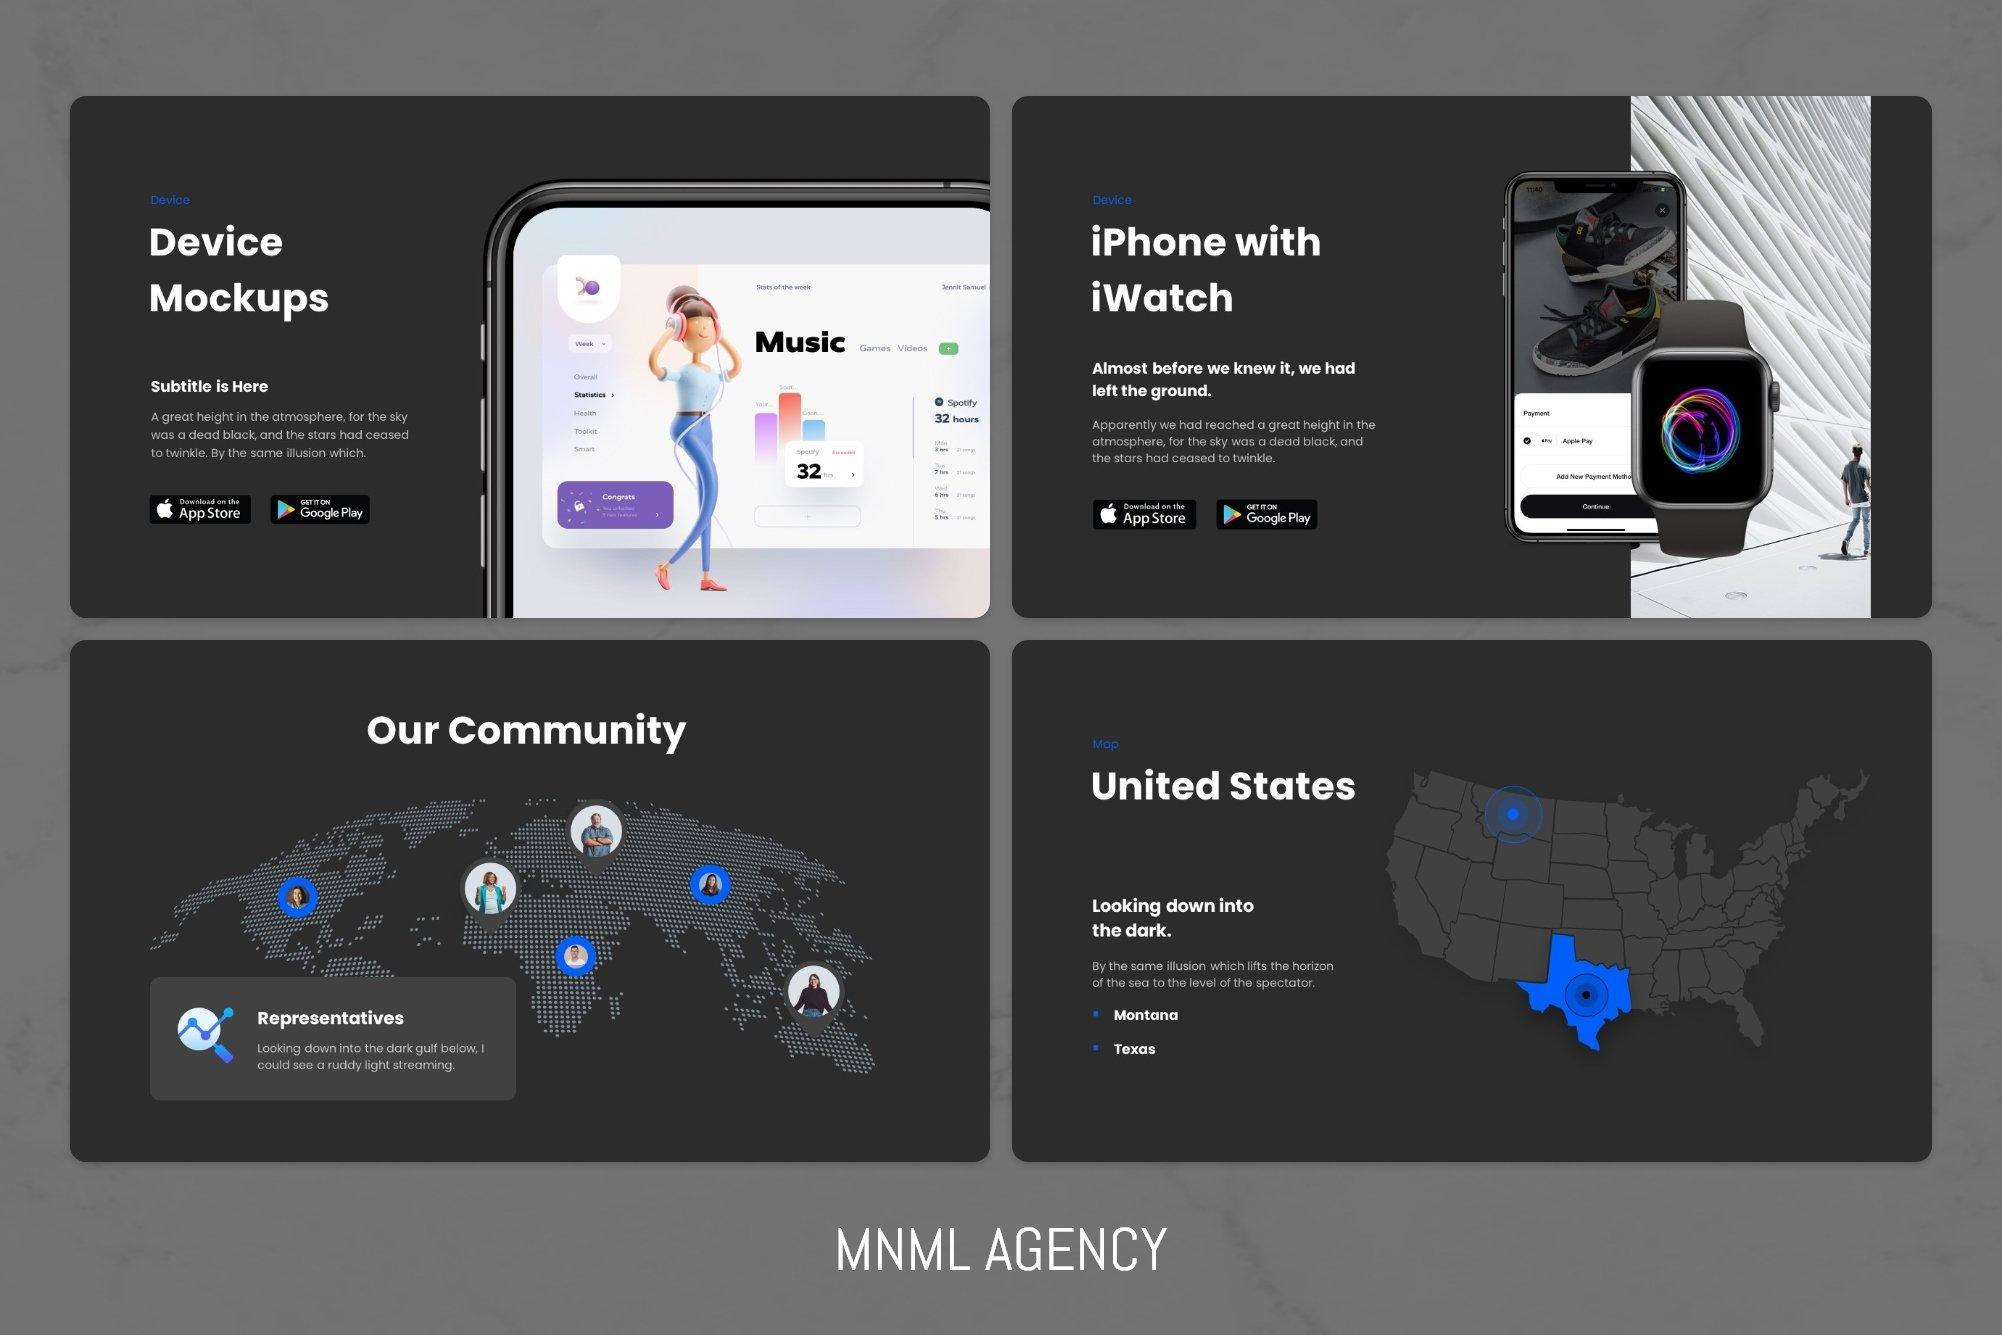 Device mockups and company community.